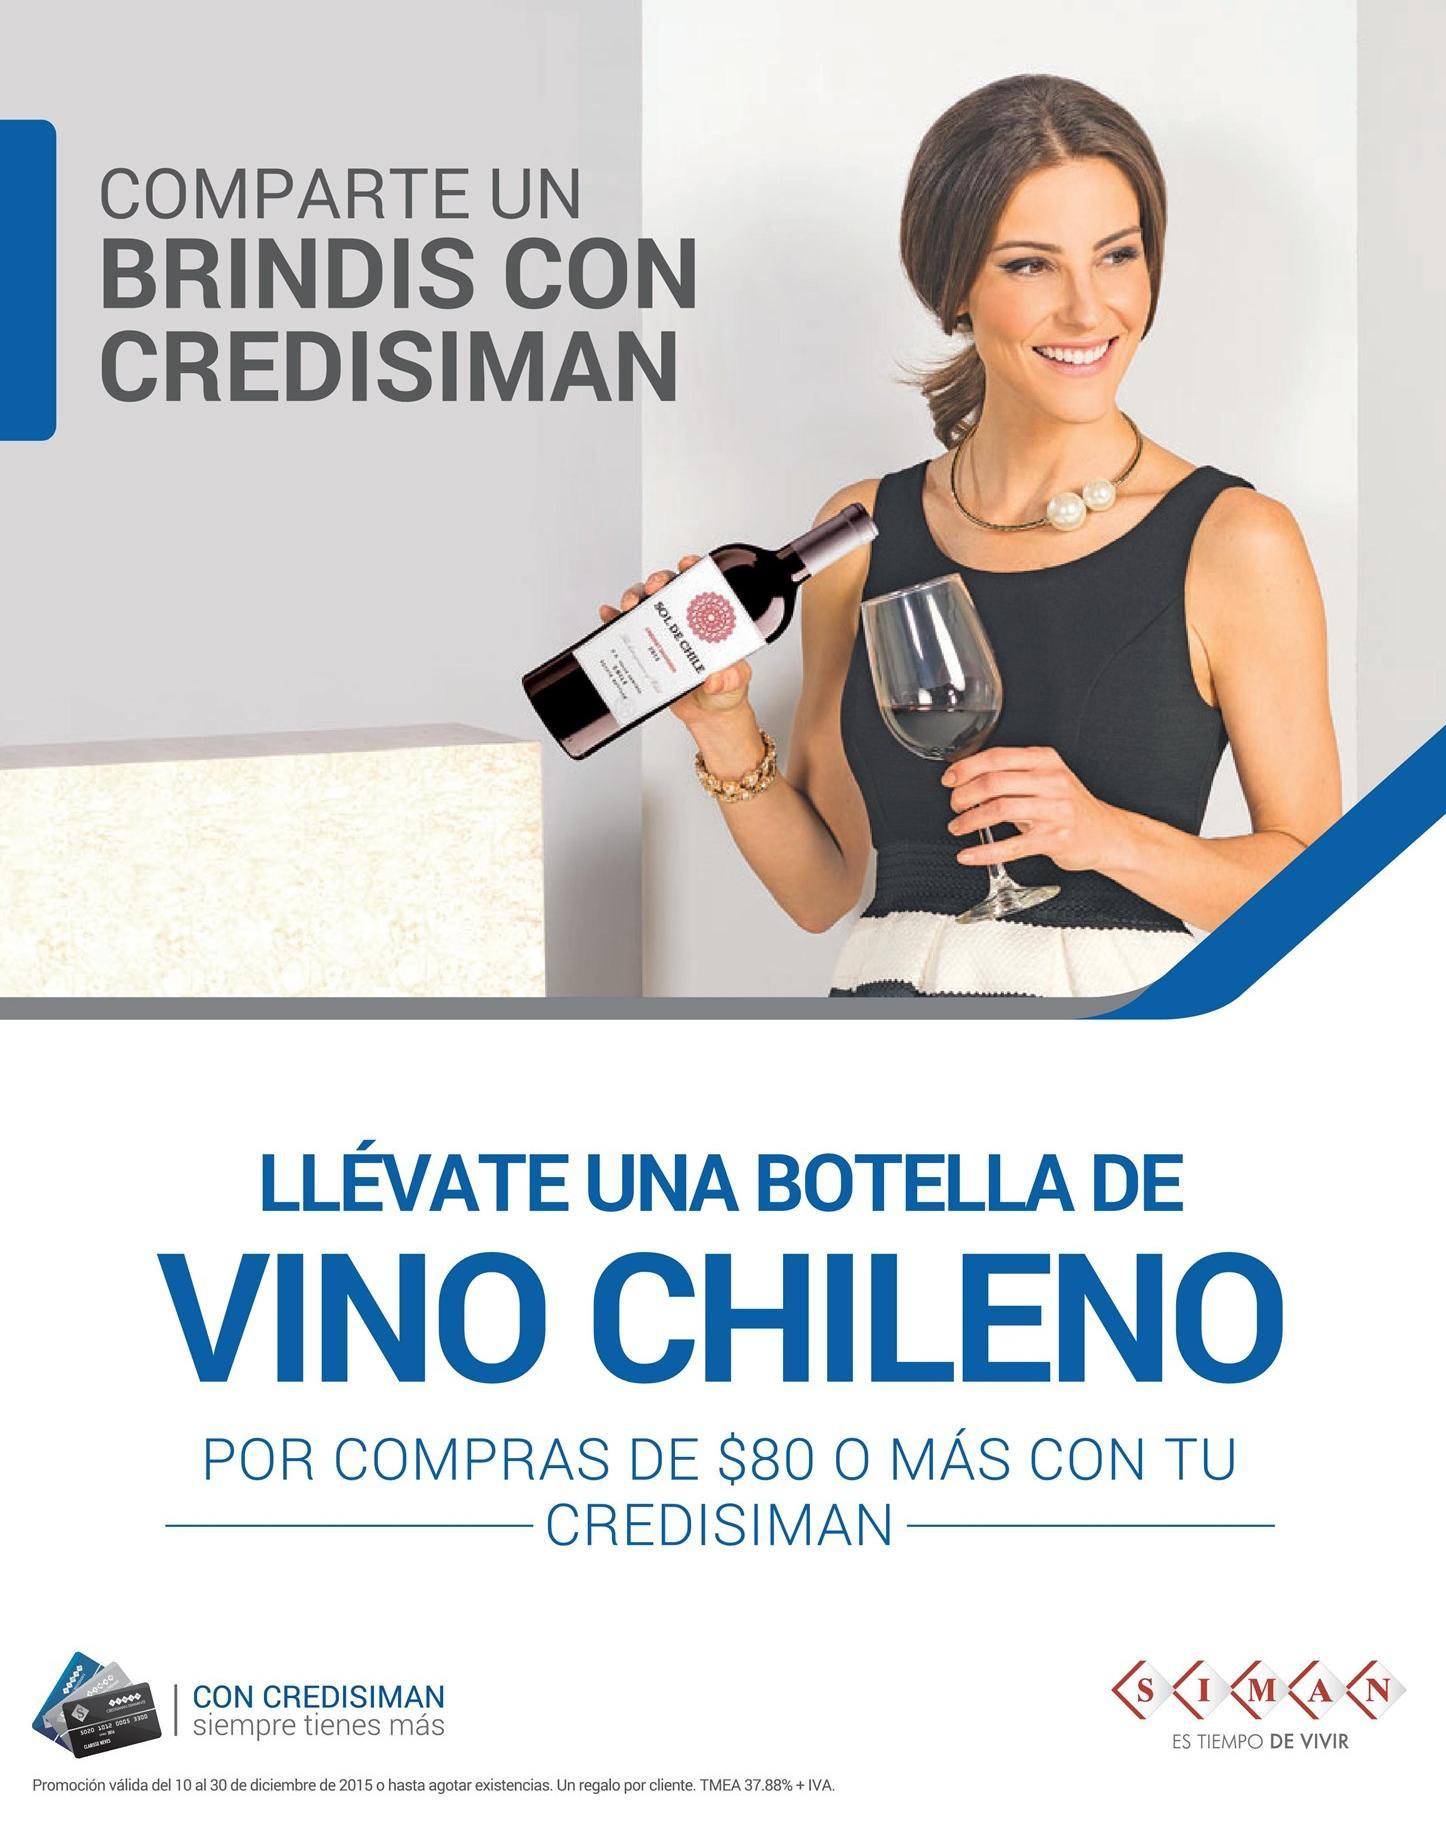 SIMAN compras te regala una botella de vino chileno